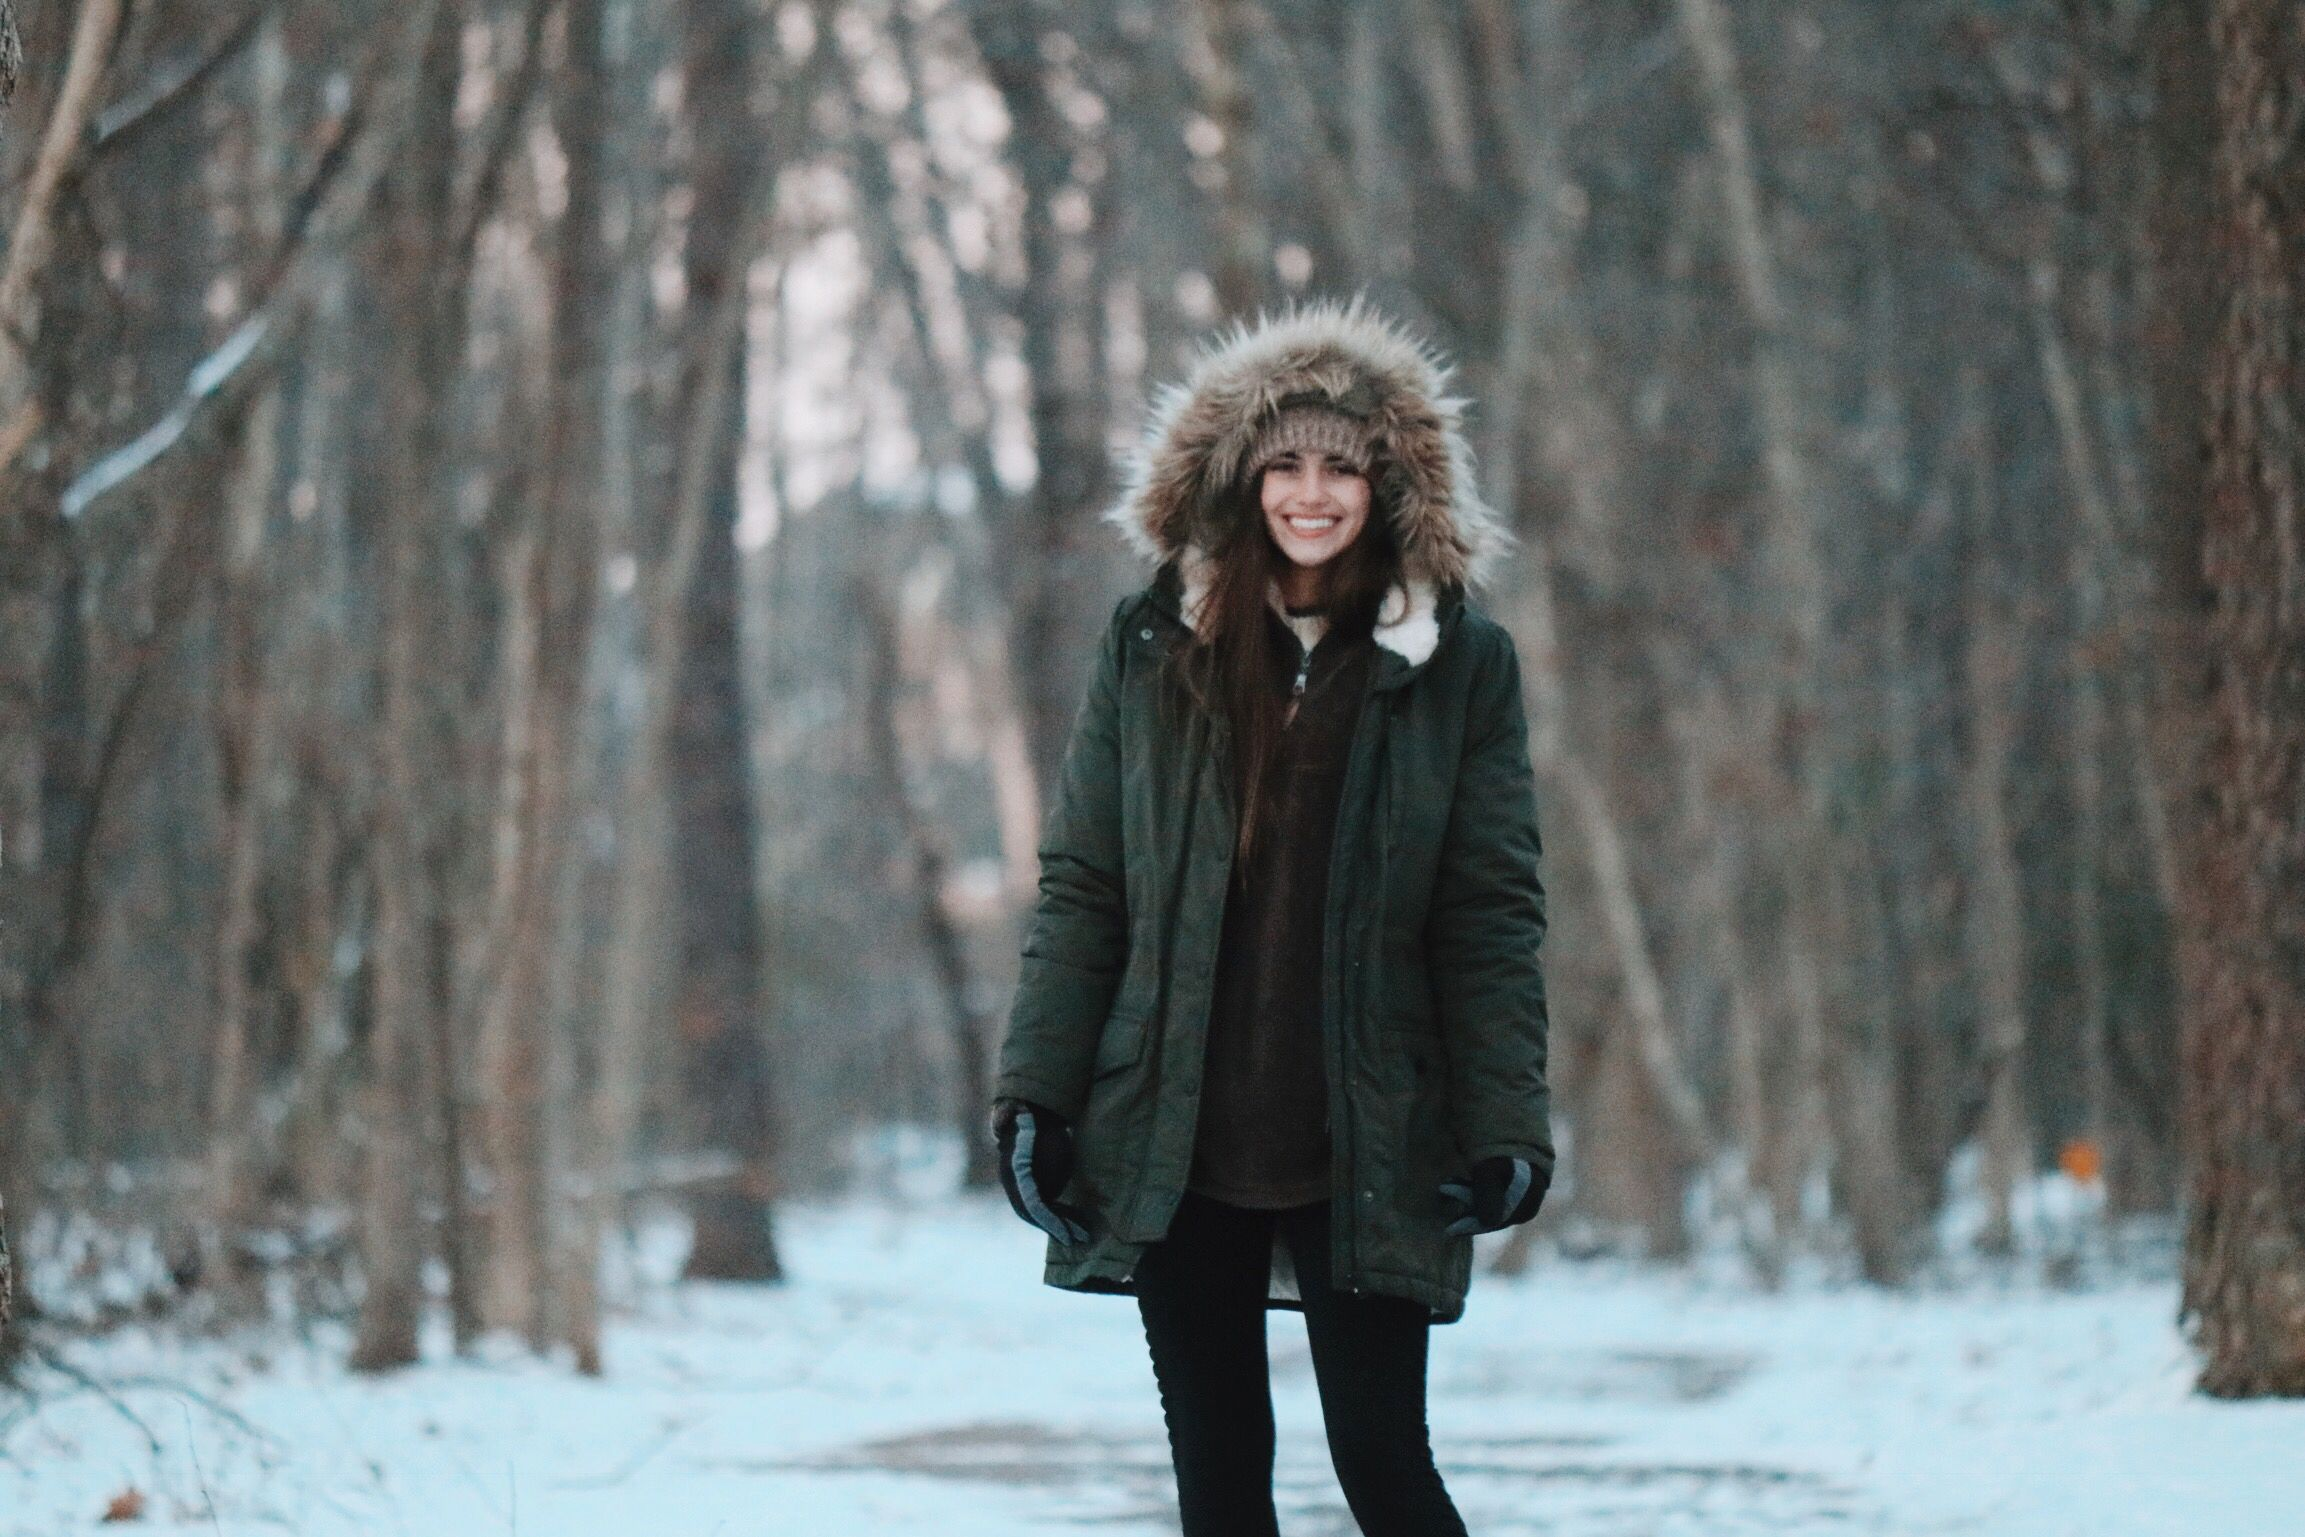 pleaseee let it snow soon Winter jackets, Canada goose